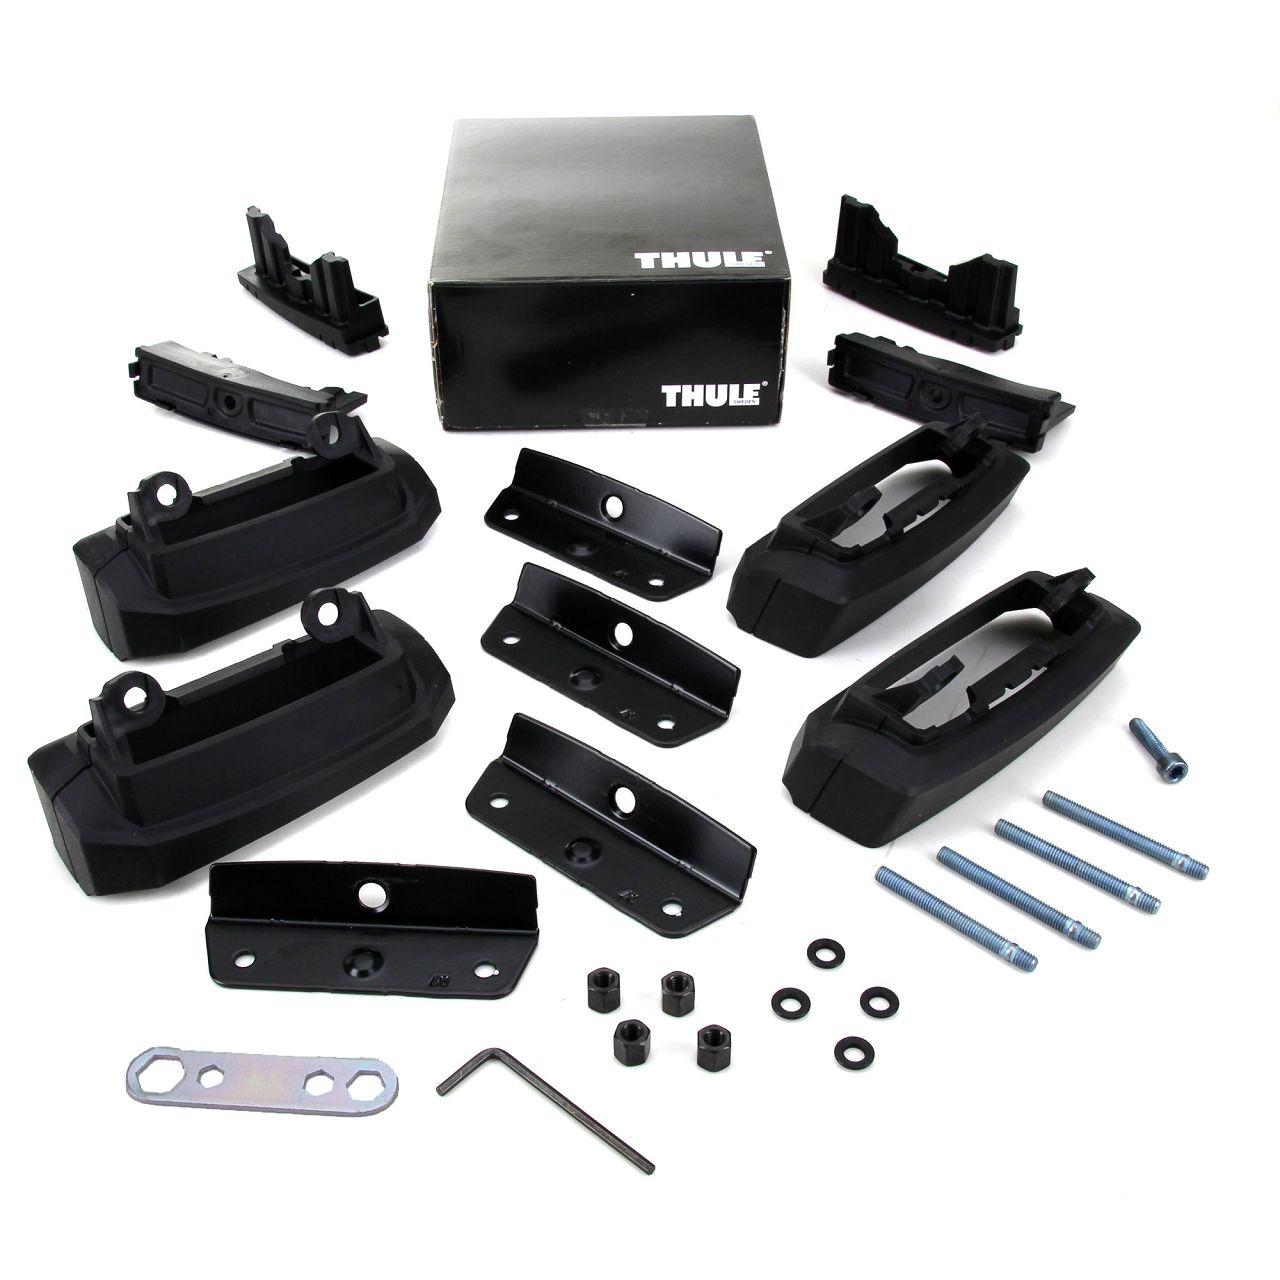 THULE Kit 3028 Montagesatz Montagekit Dachträger FixPoint XT